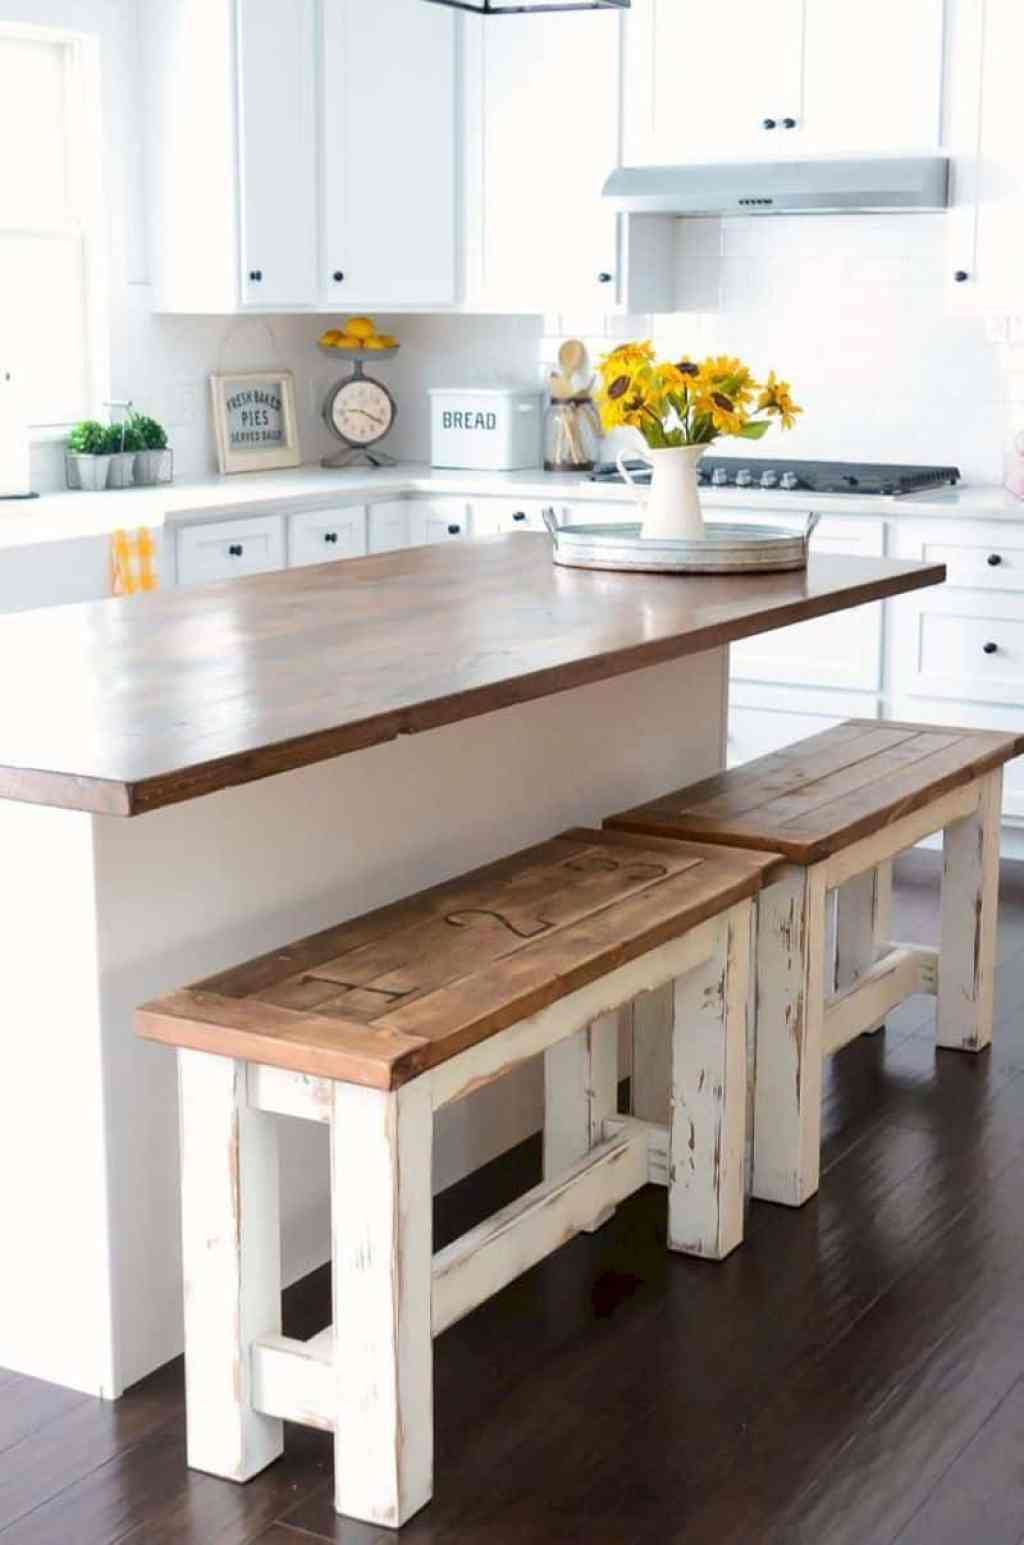 10 Farmhouse Kitchen Decor Ideas That Would Make Joanna ... on Farmhouse Kitchen Ideas  id=53016